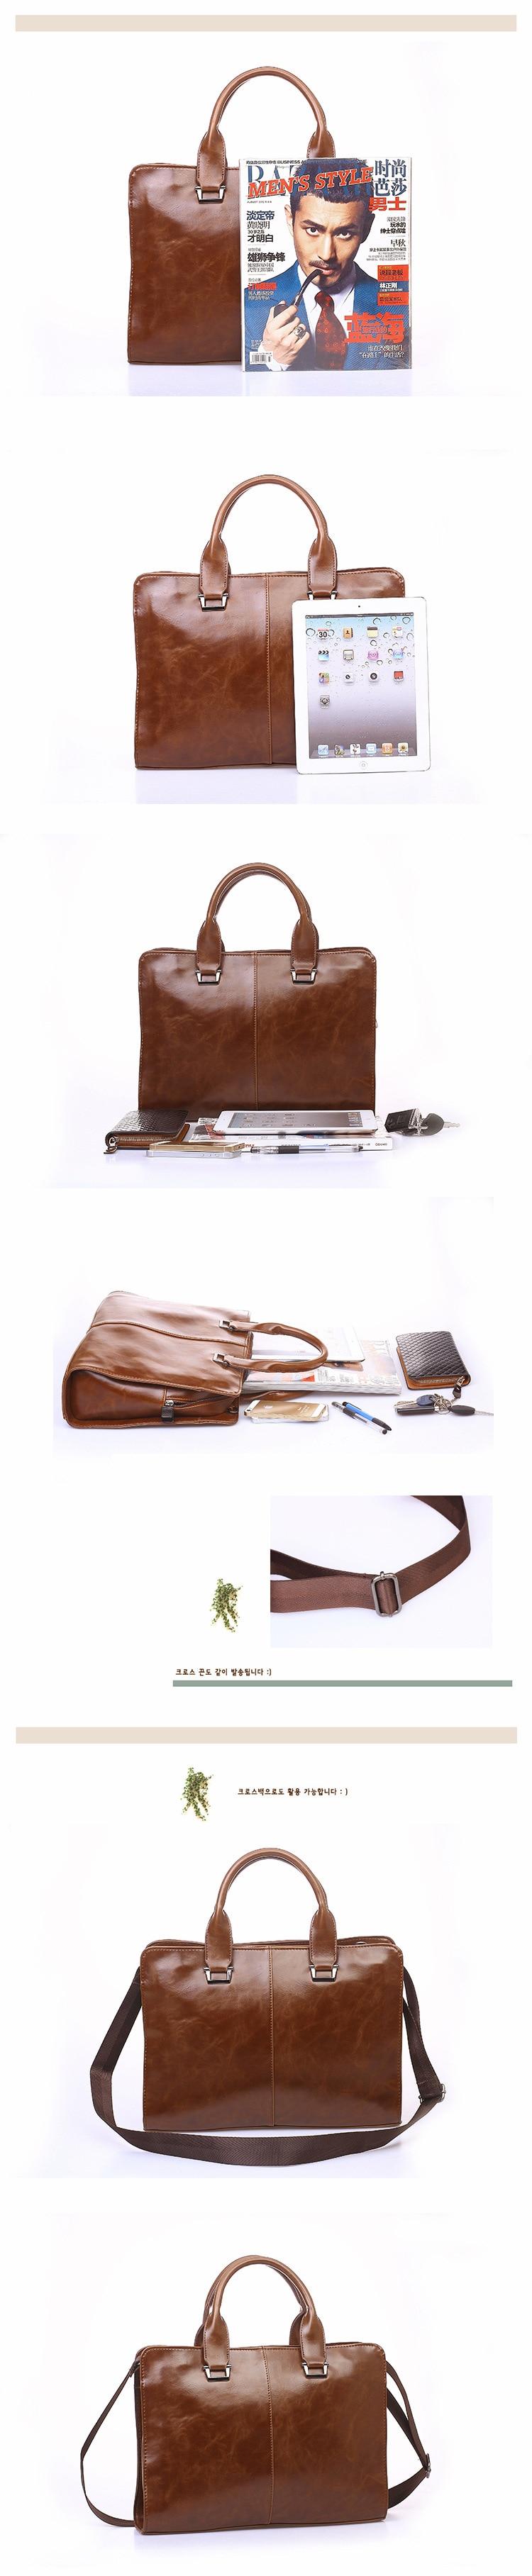 Classic Woman Men's Briefcases Leather Business Office Computer Laptop Bags austere Vintage Shoulder Crossbody Bags For ipad Men